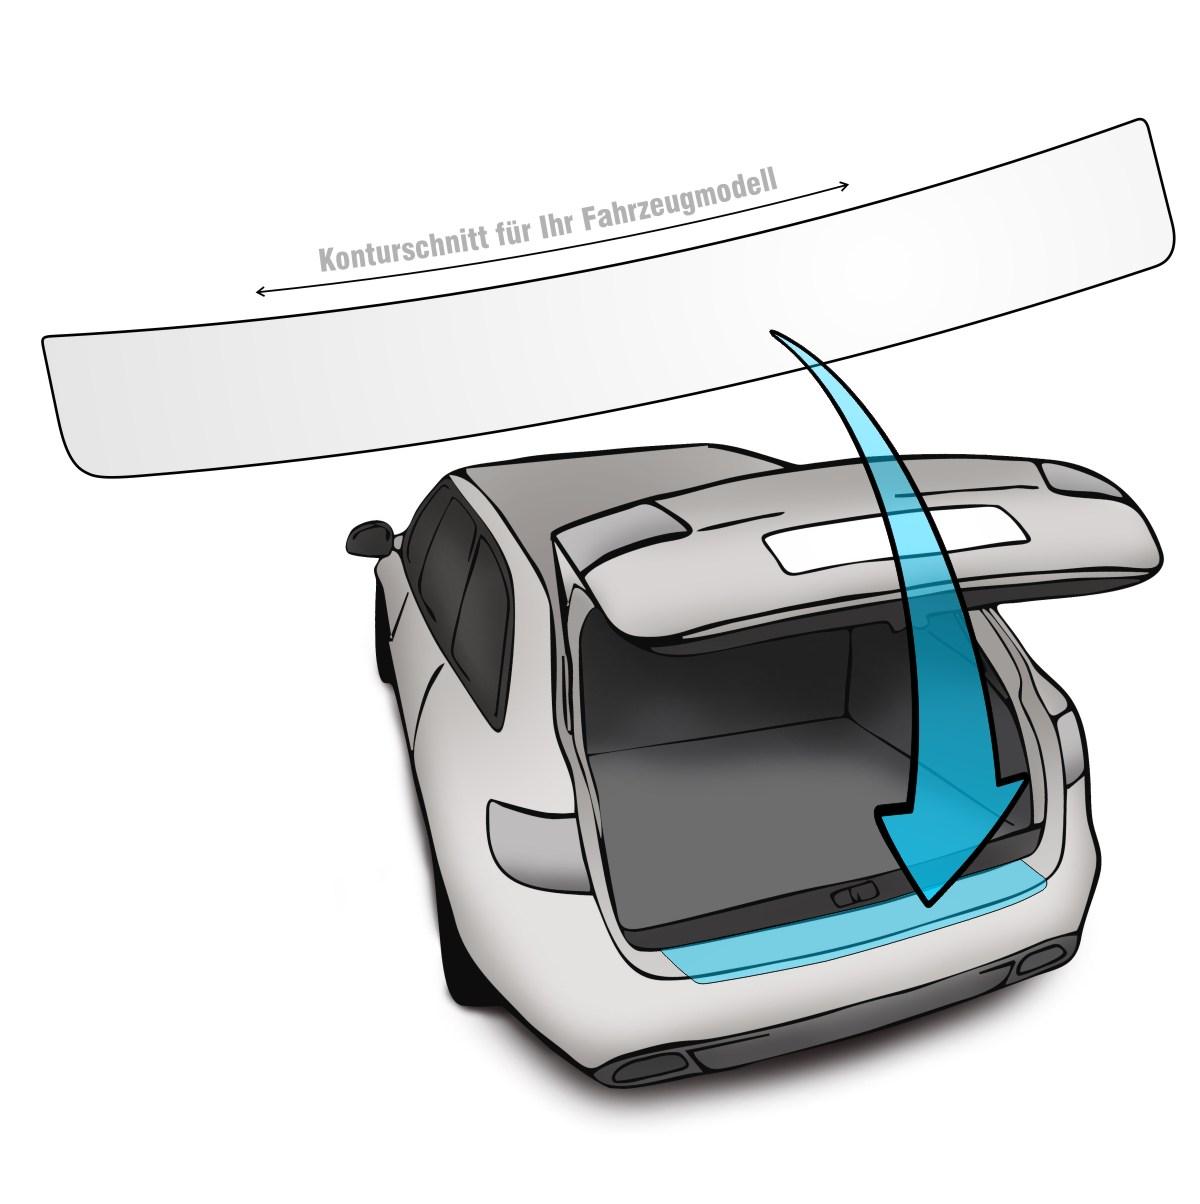 LADEKANTENSCHUTZ Lackschutzfolie für CITROEN C4 GRAND PICASSO transparent